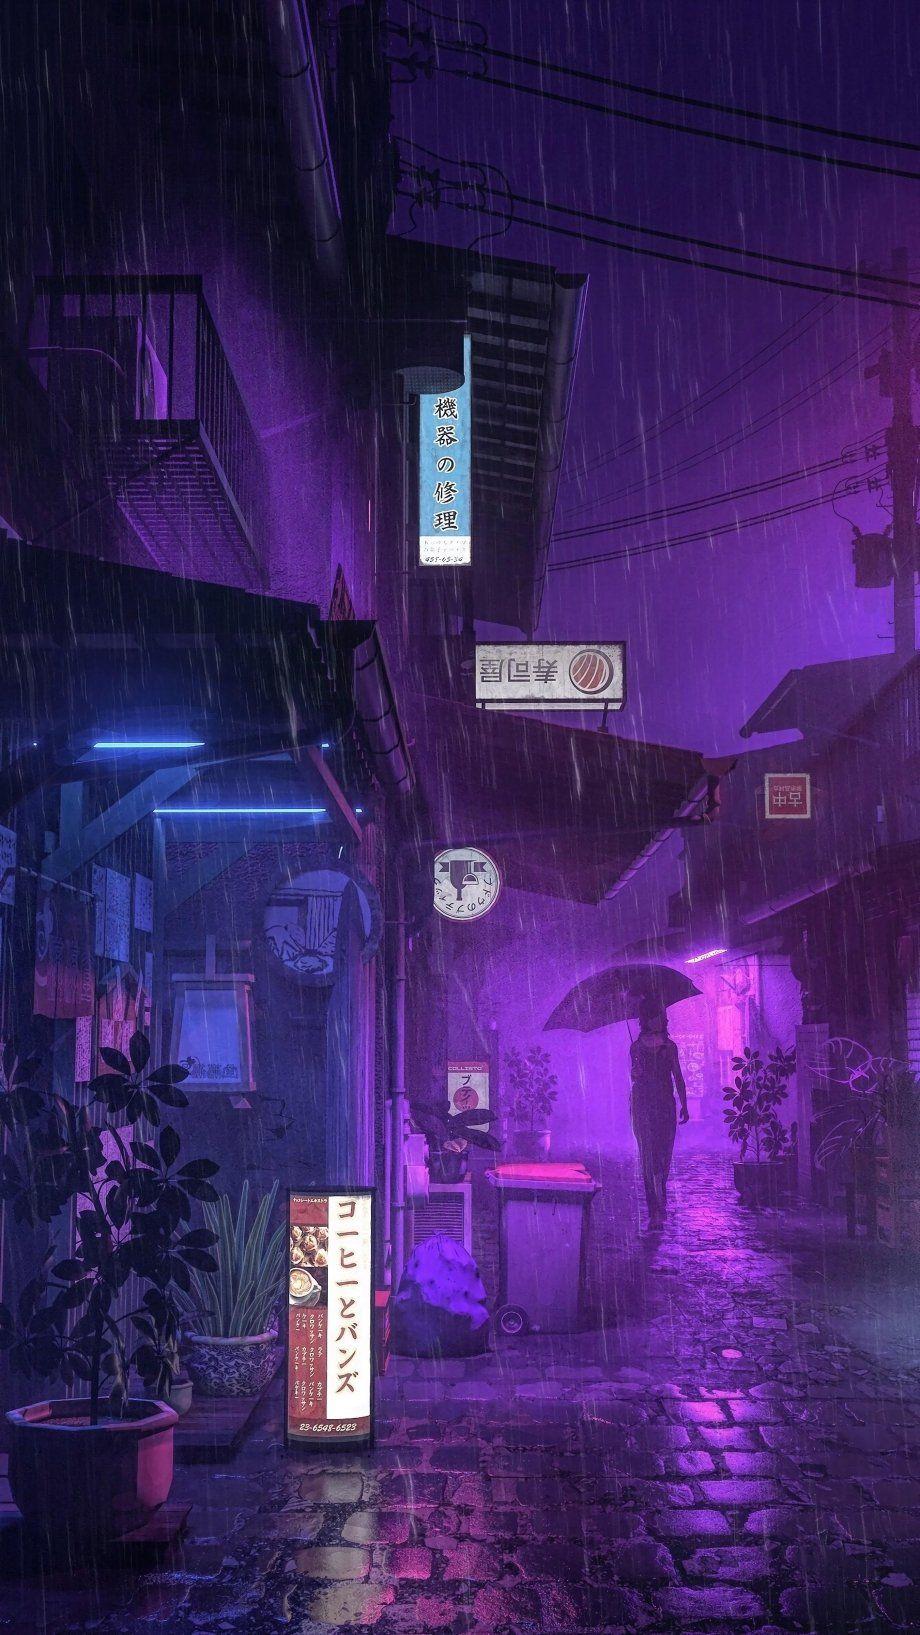 Humanity Thechive Dark Purple Aesthetic Purple Wallpaper Purple City Dark purple aesthetic wallpaper city